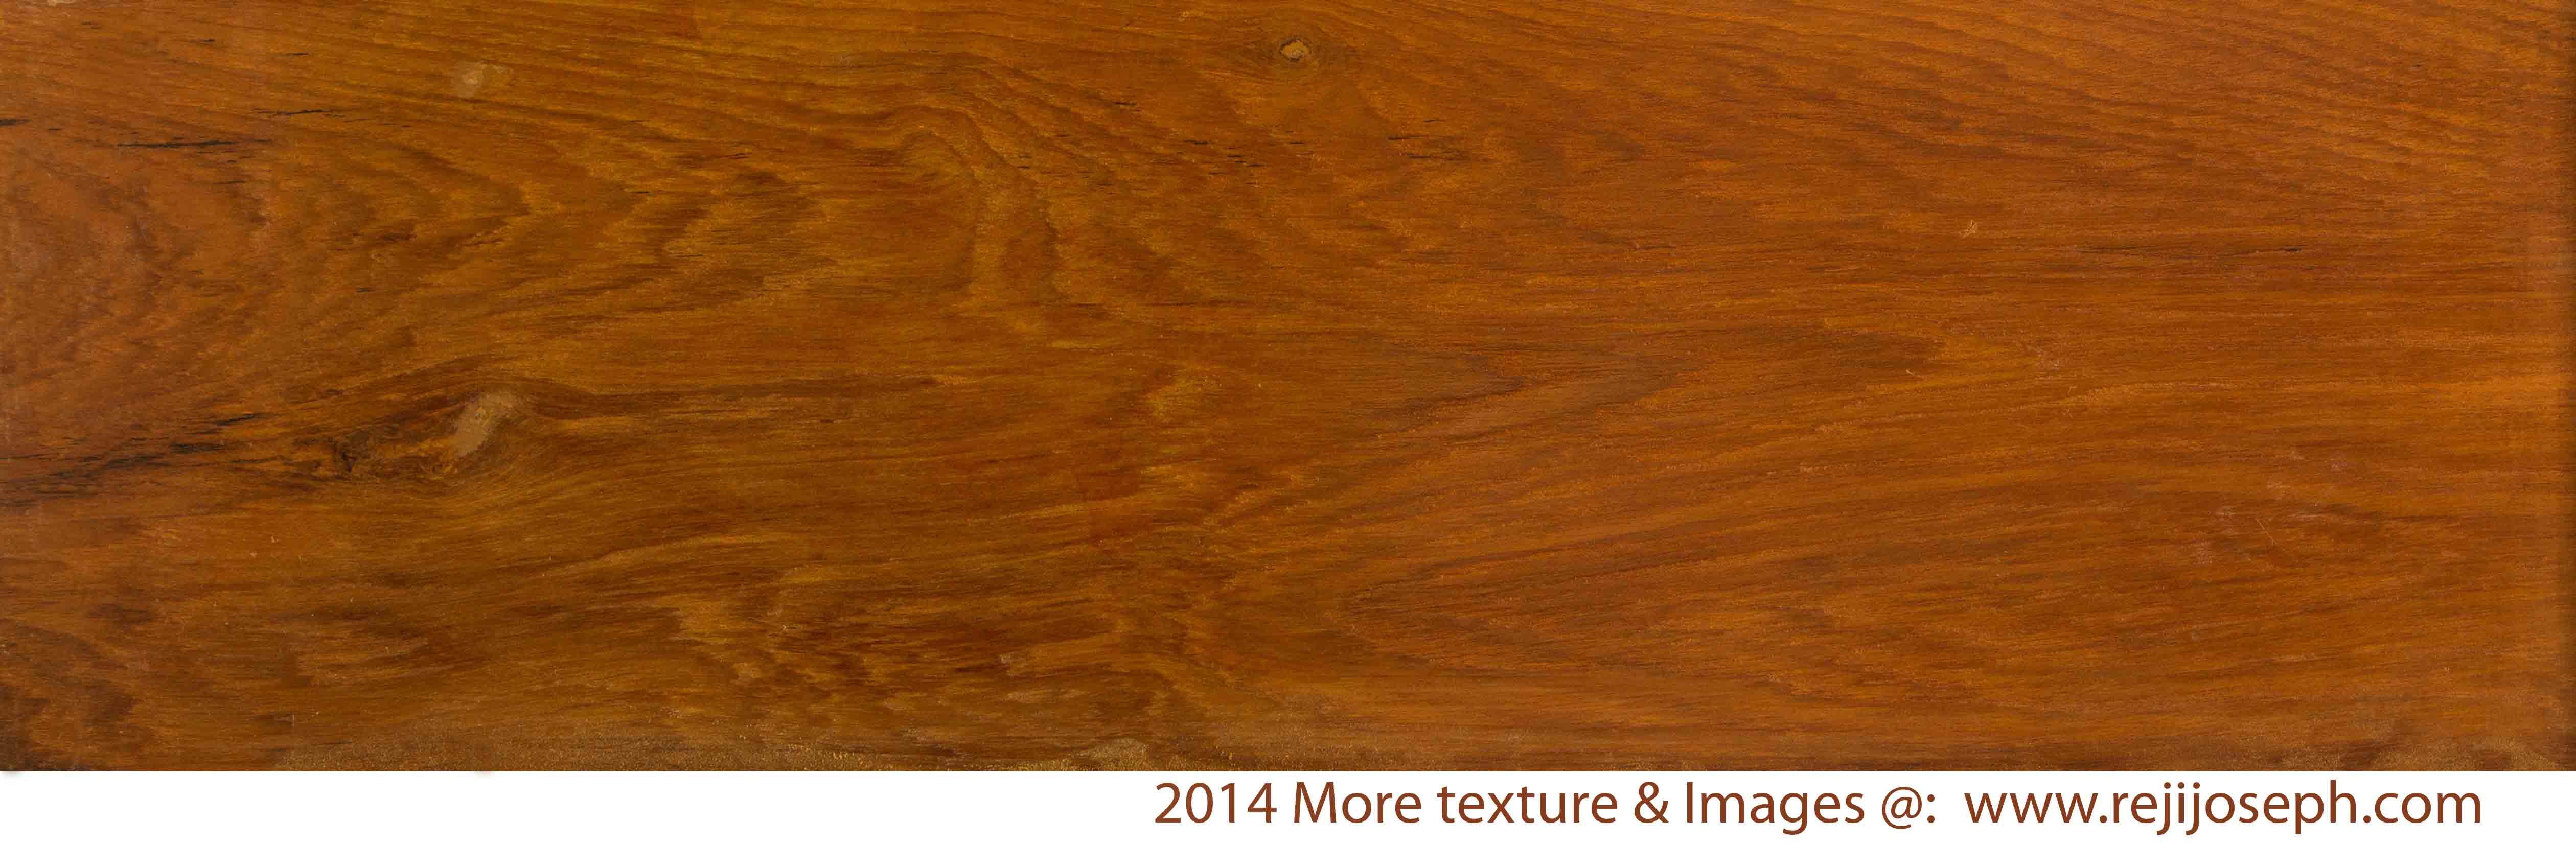 Plane Wood texture 00002